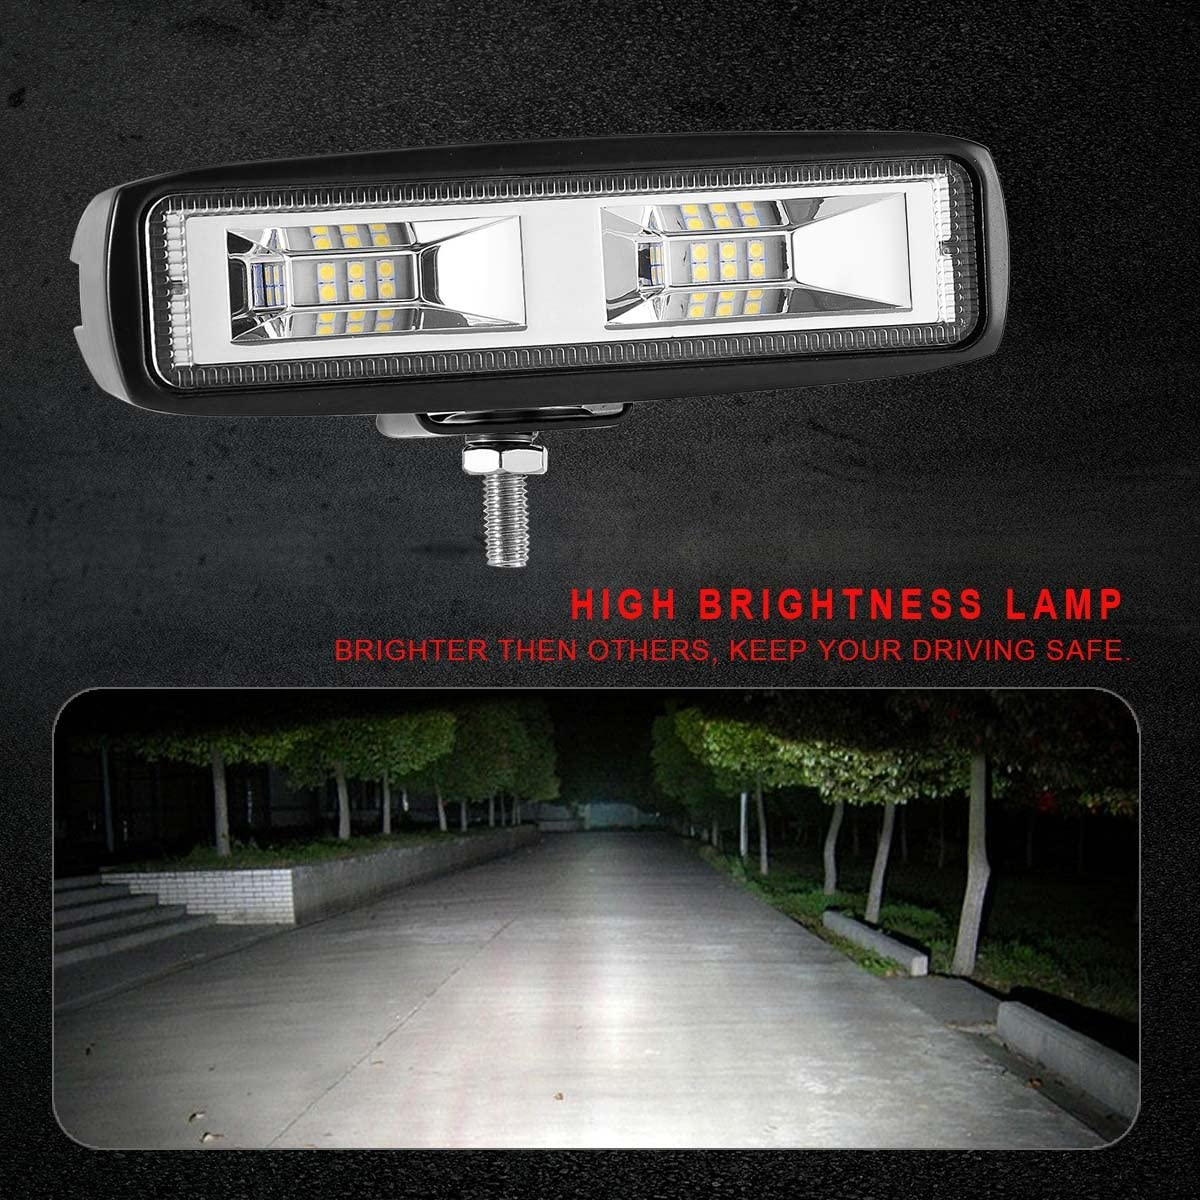 KAWELL 2 Pack 20W Flood Cree Led Light Bar Flush Mount Led Pods Off Road Backup Driving Lights Fog Lamp for Jeep ATV 4X4s SUV Truck Boat